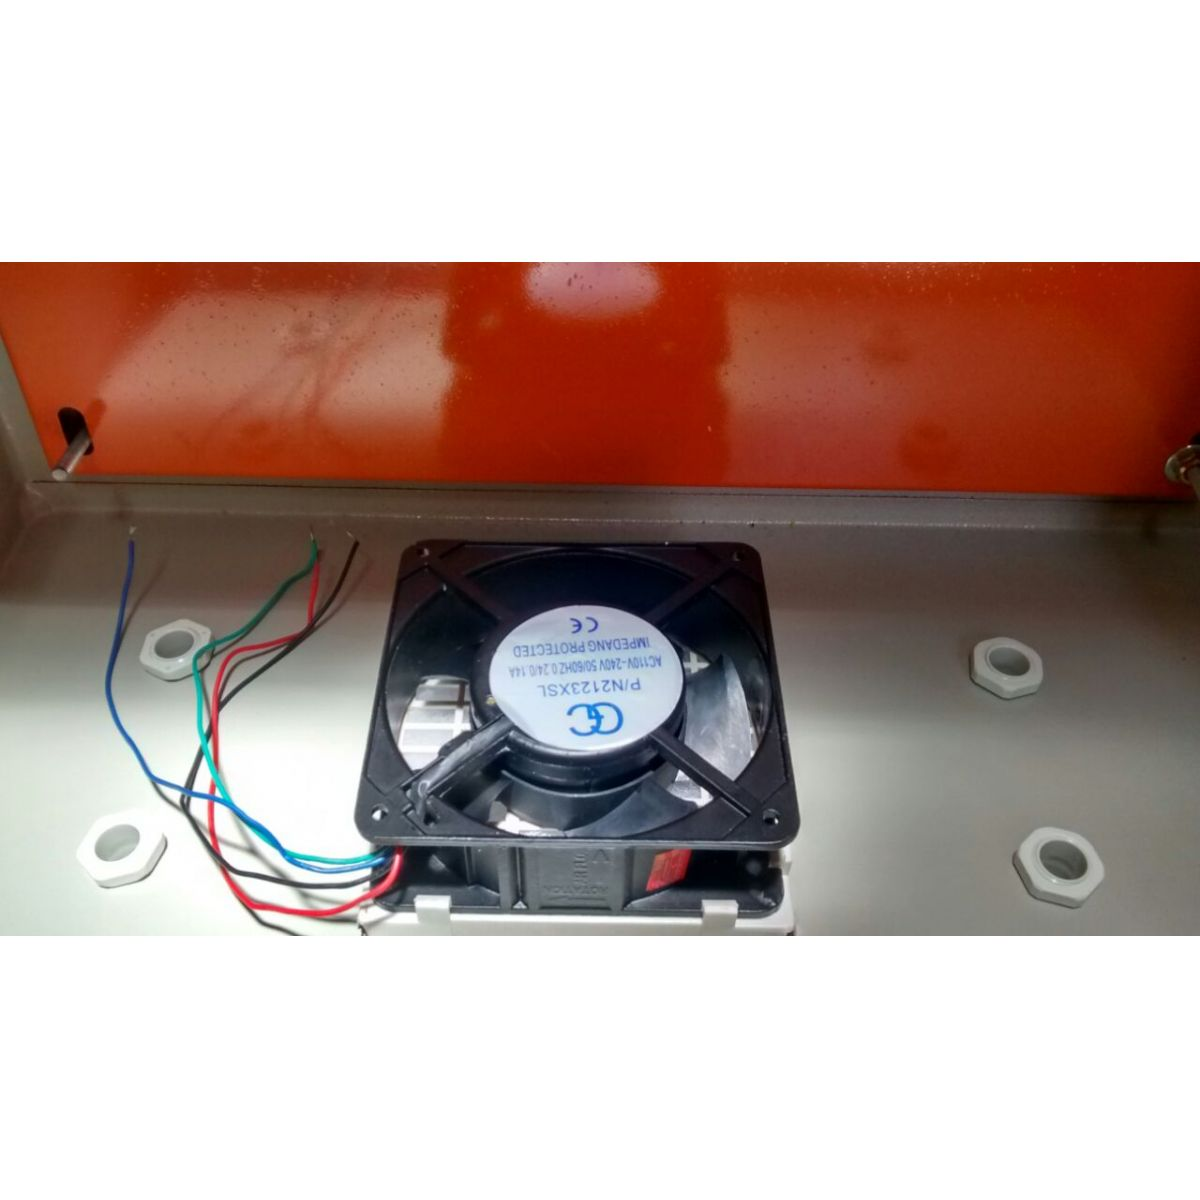 Caixa Hermética Em Aço 60x40x25 + Cooler + Filtro P Cooler